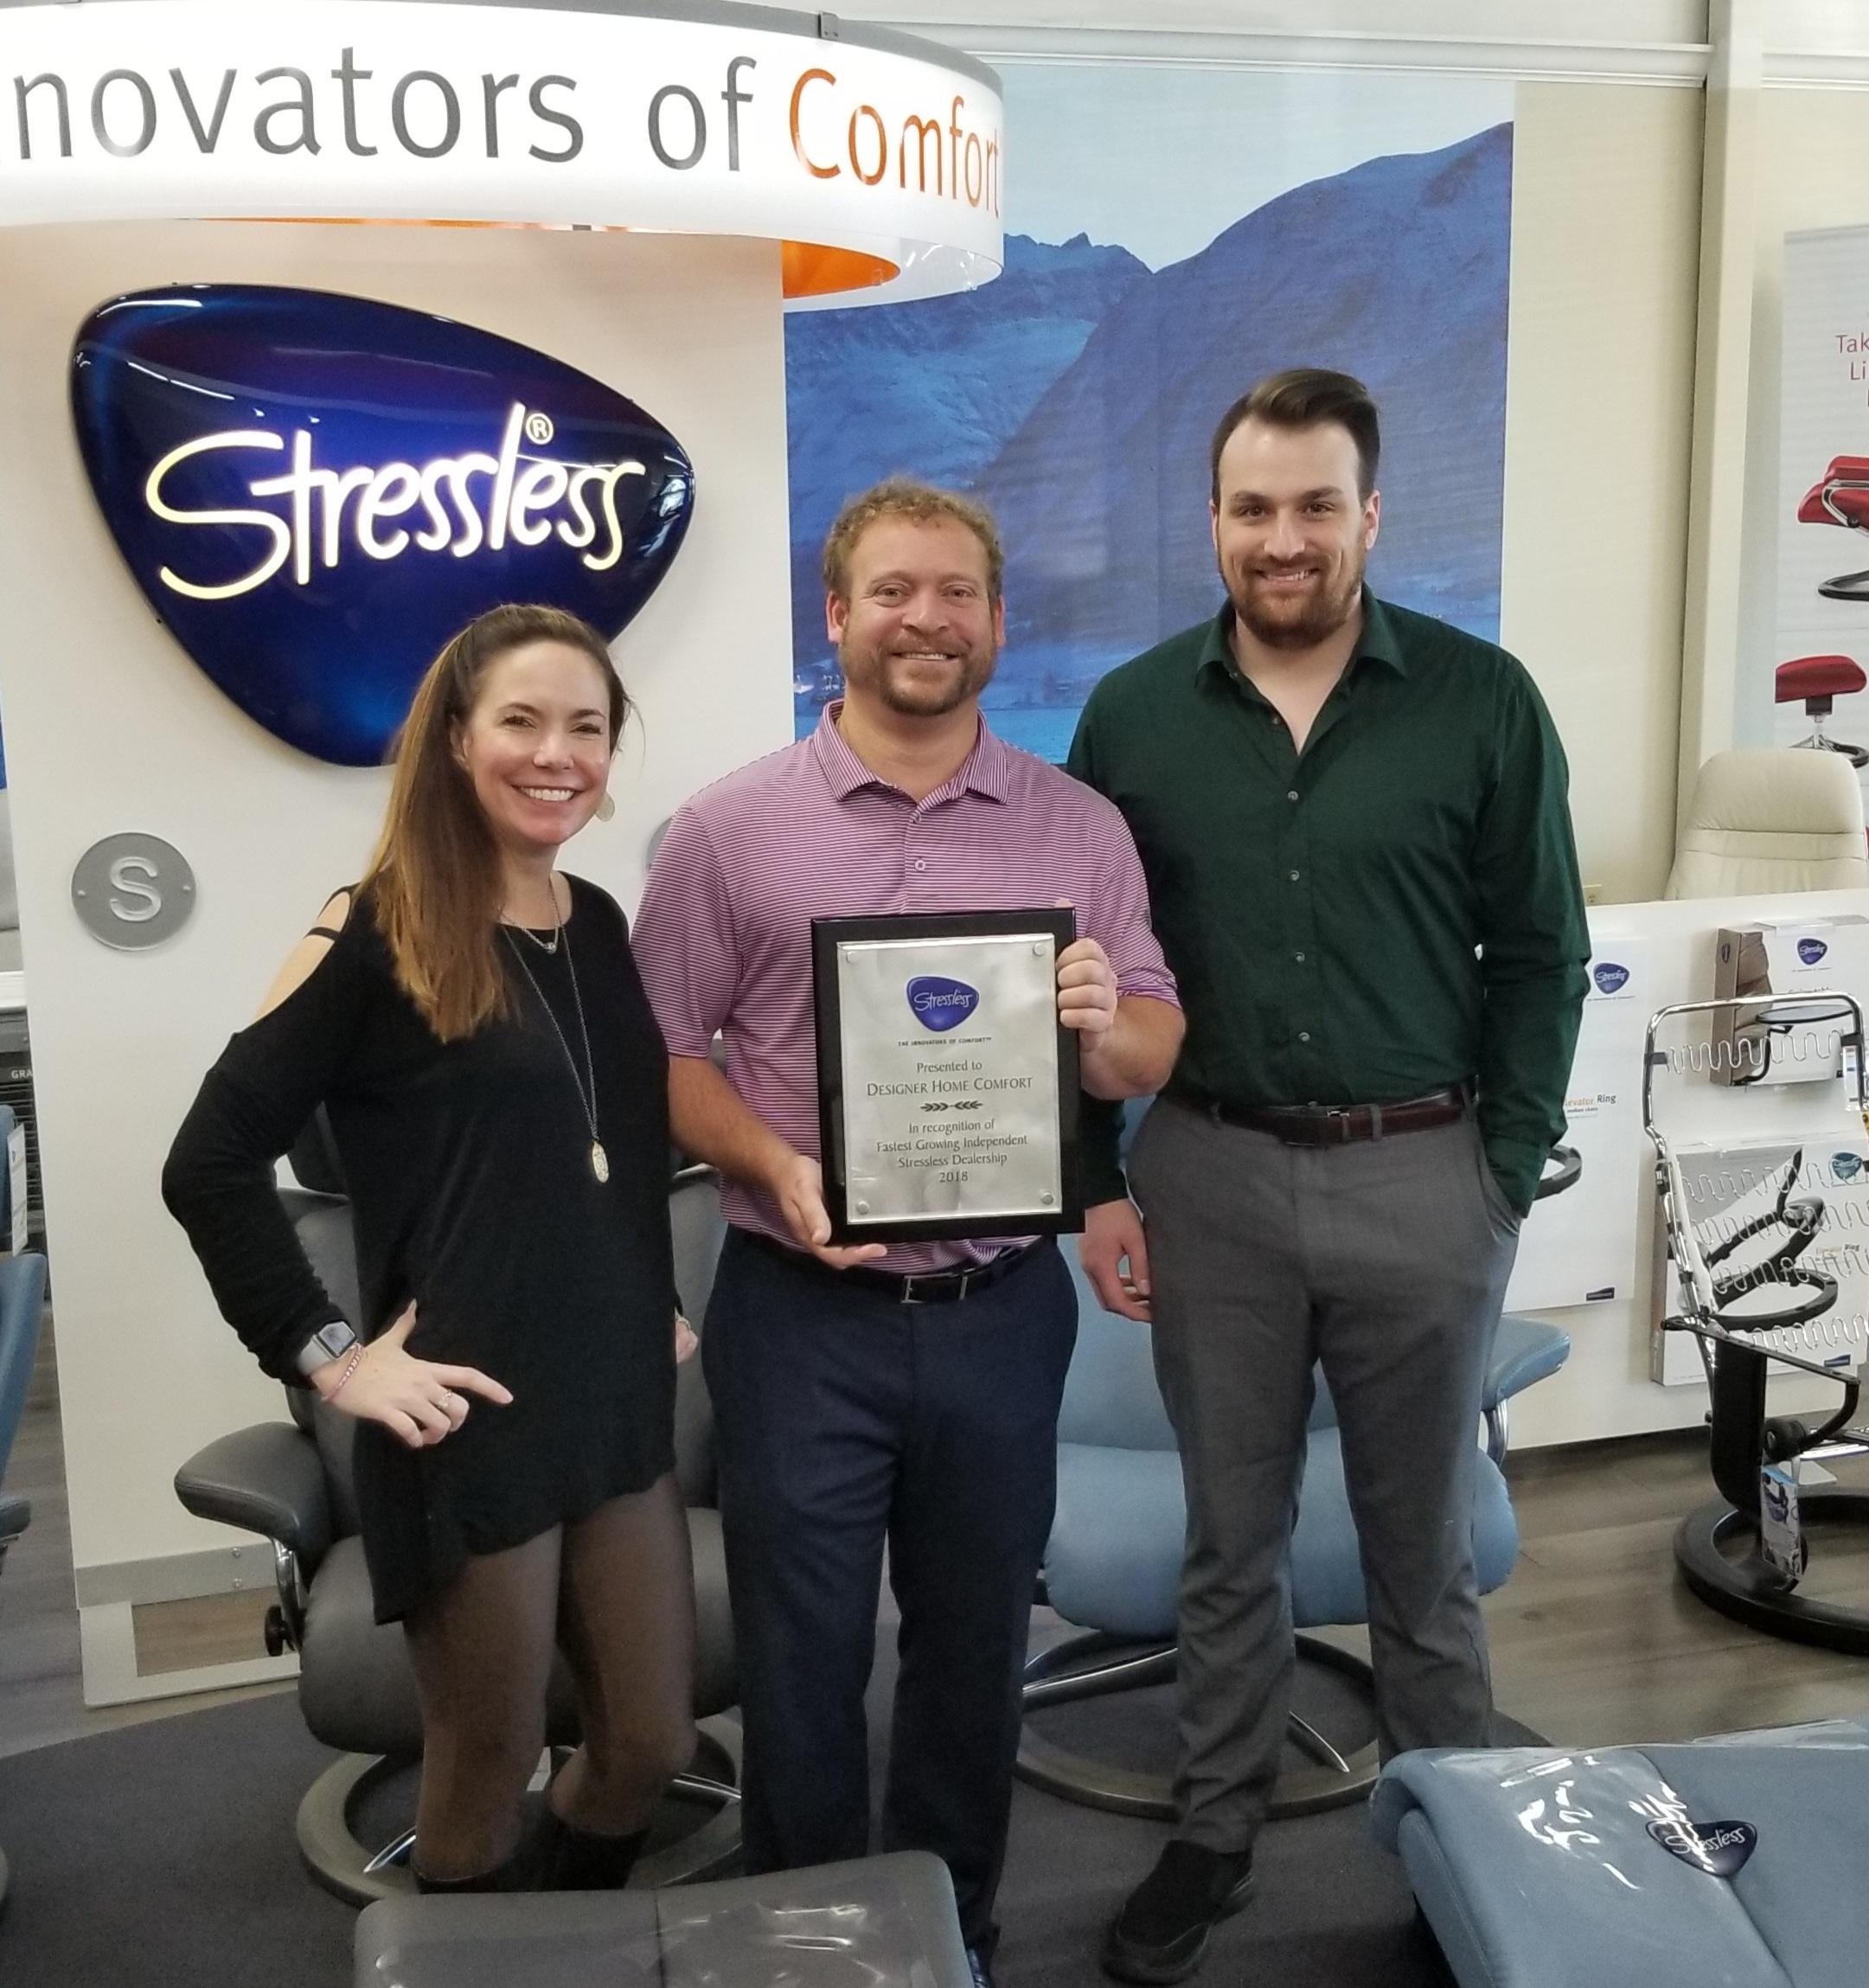 Receiving an Award From Ekornes - Fasting Growing Dealership!